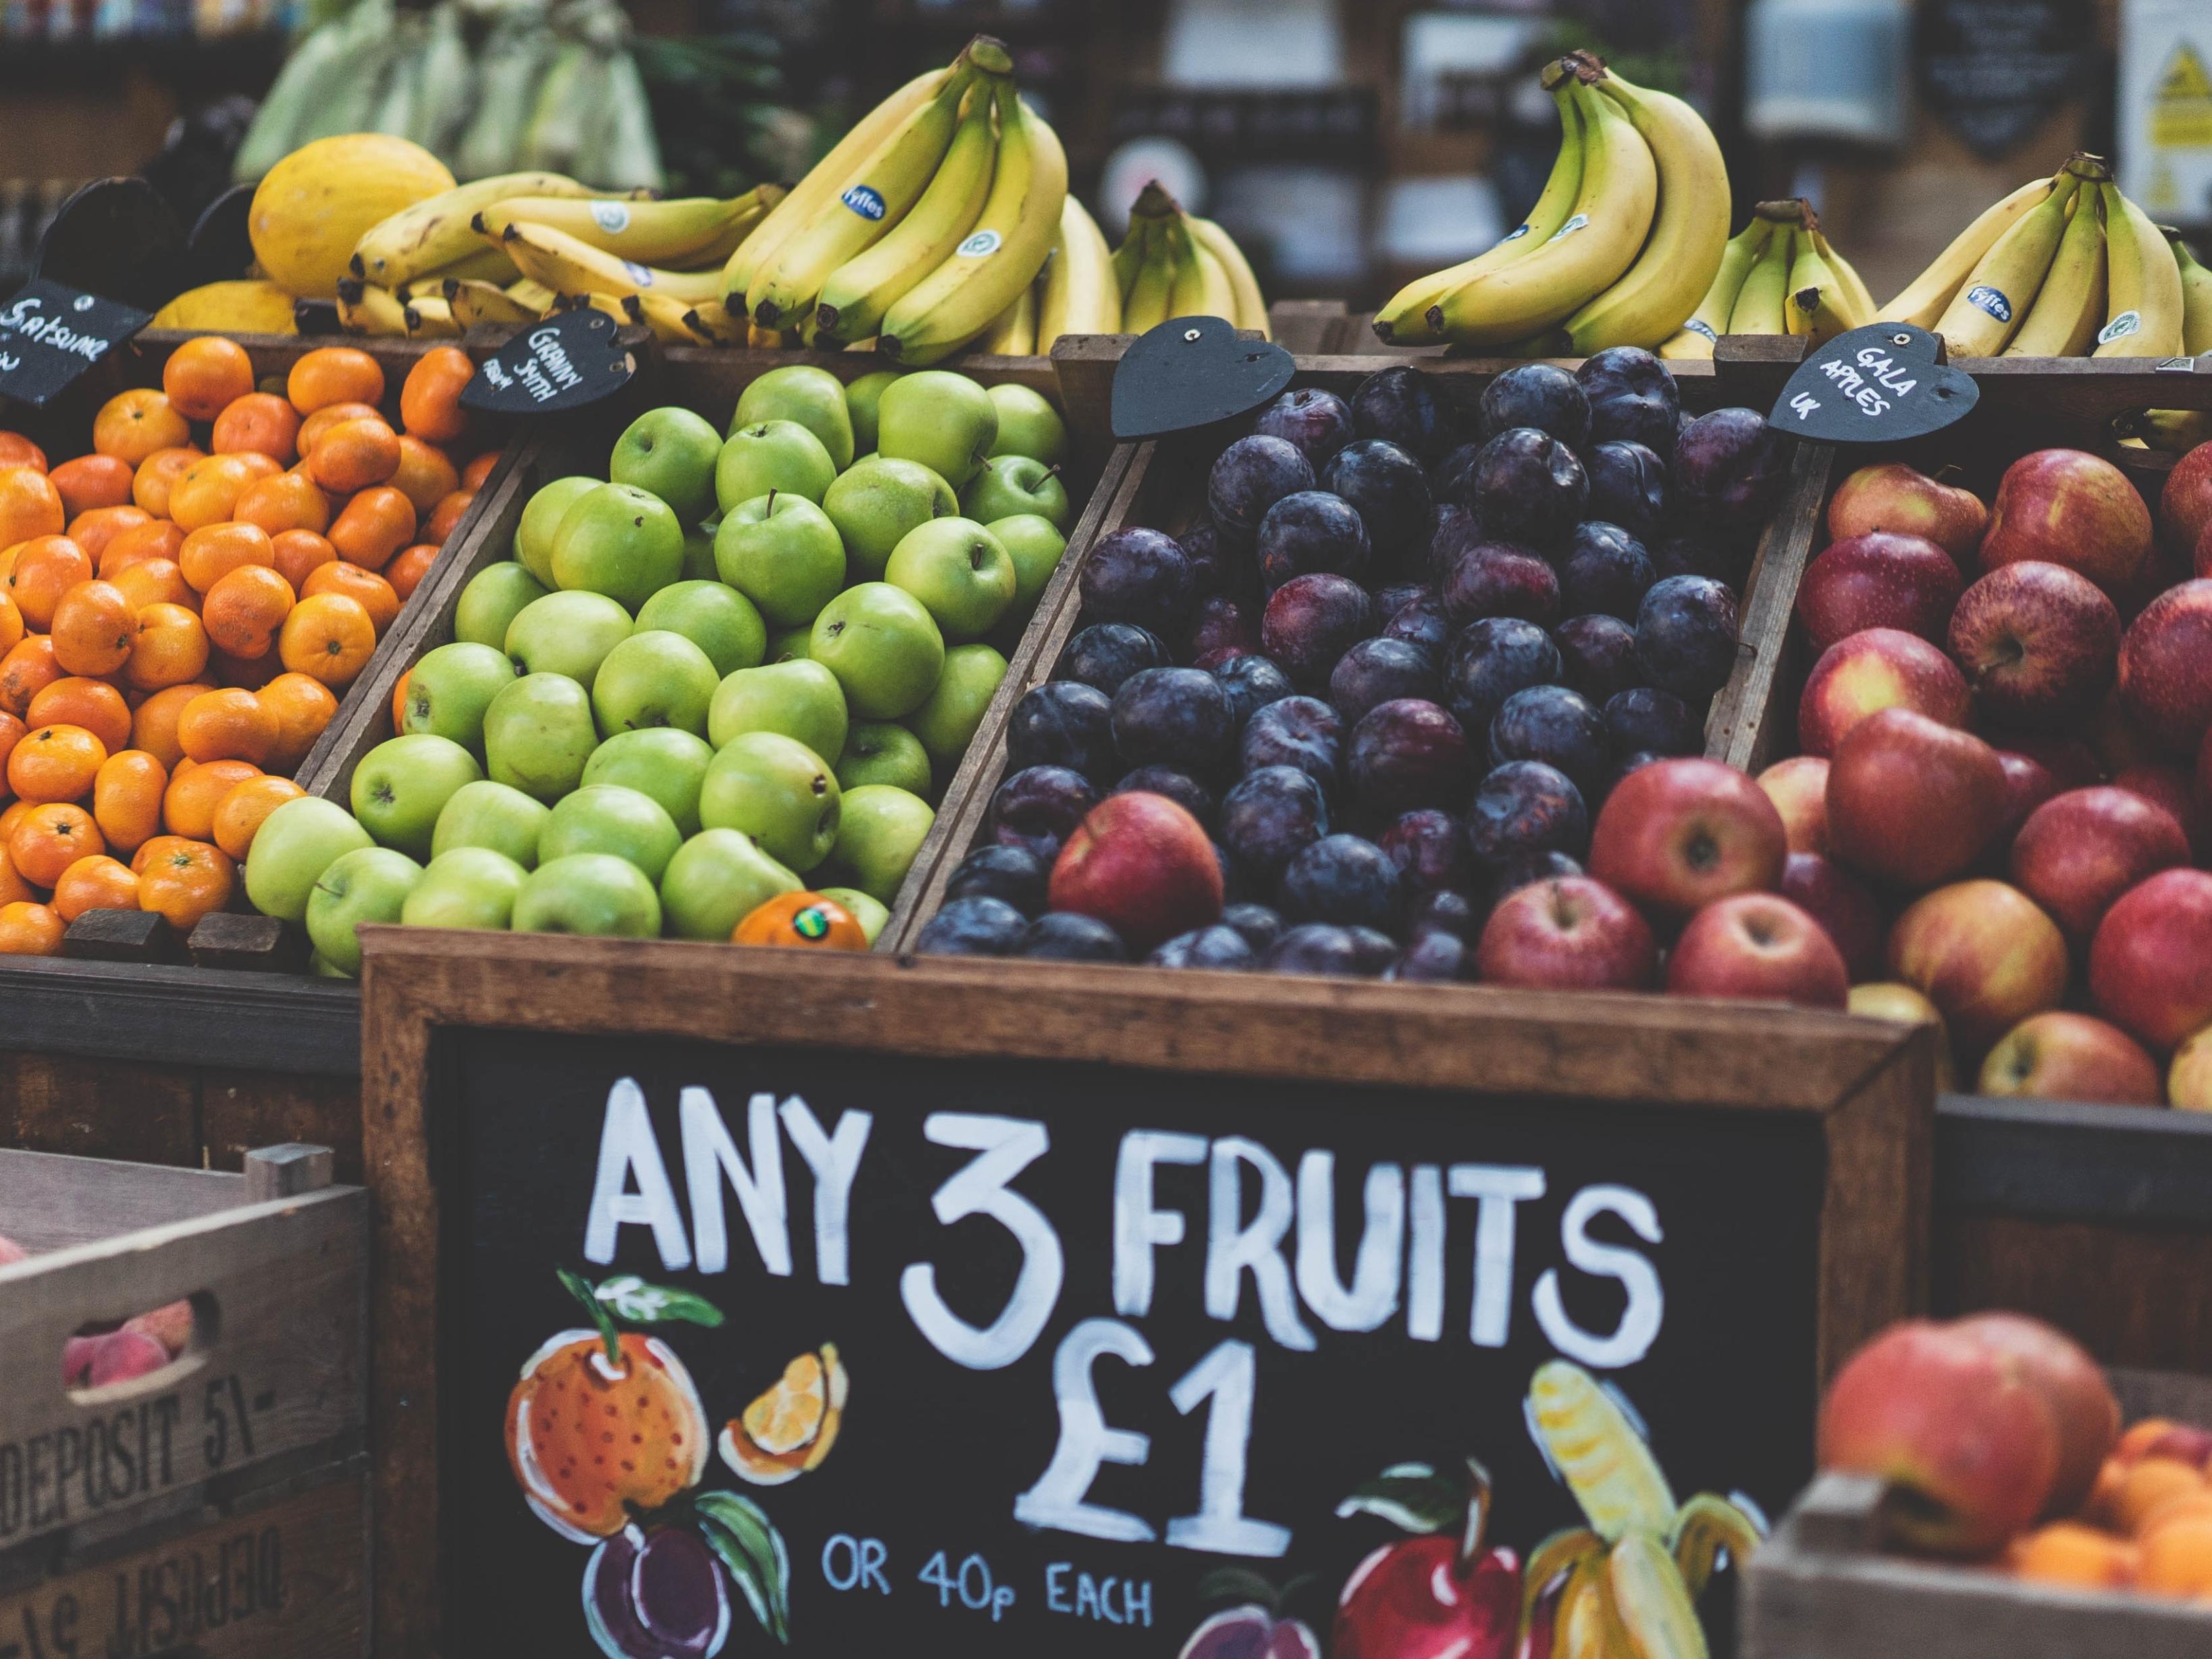 Fruit Market. Image Credit: Tom Grunbauer/Unsplash